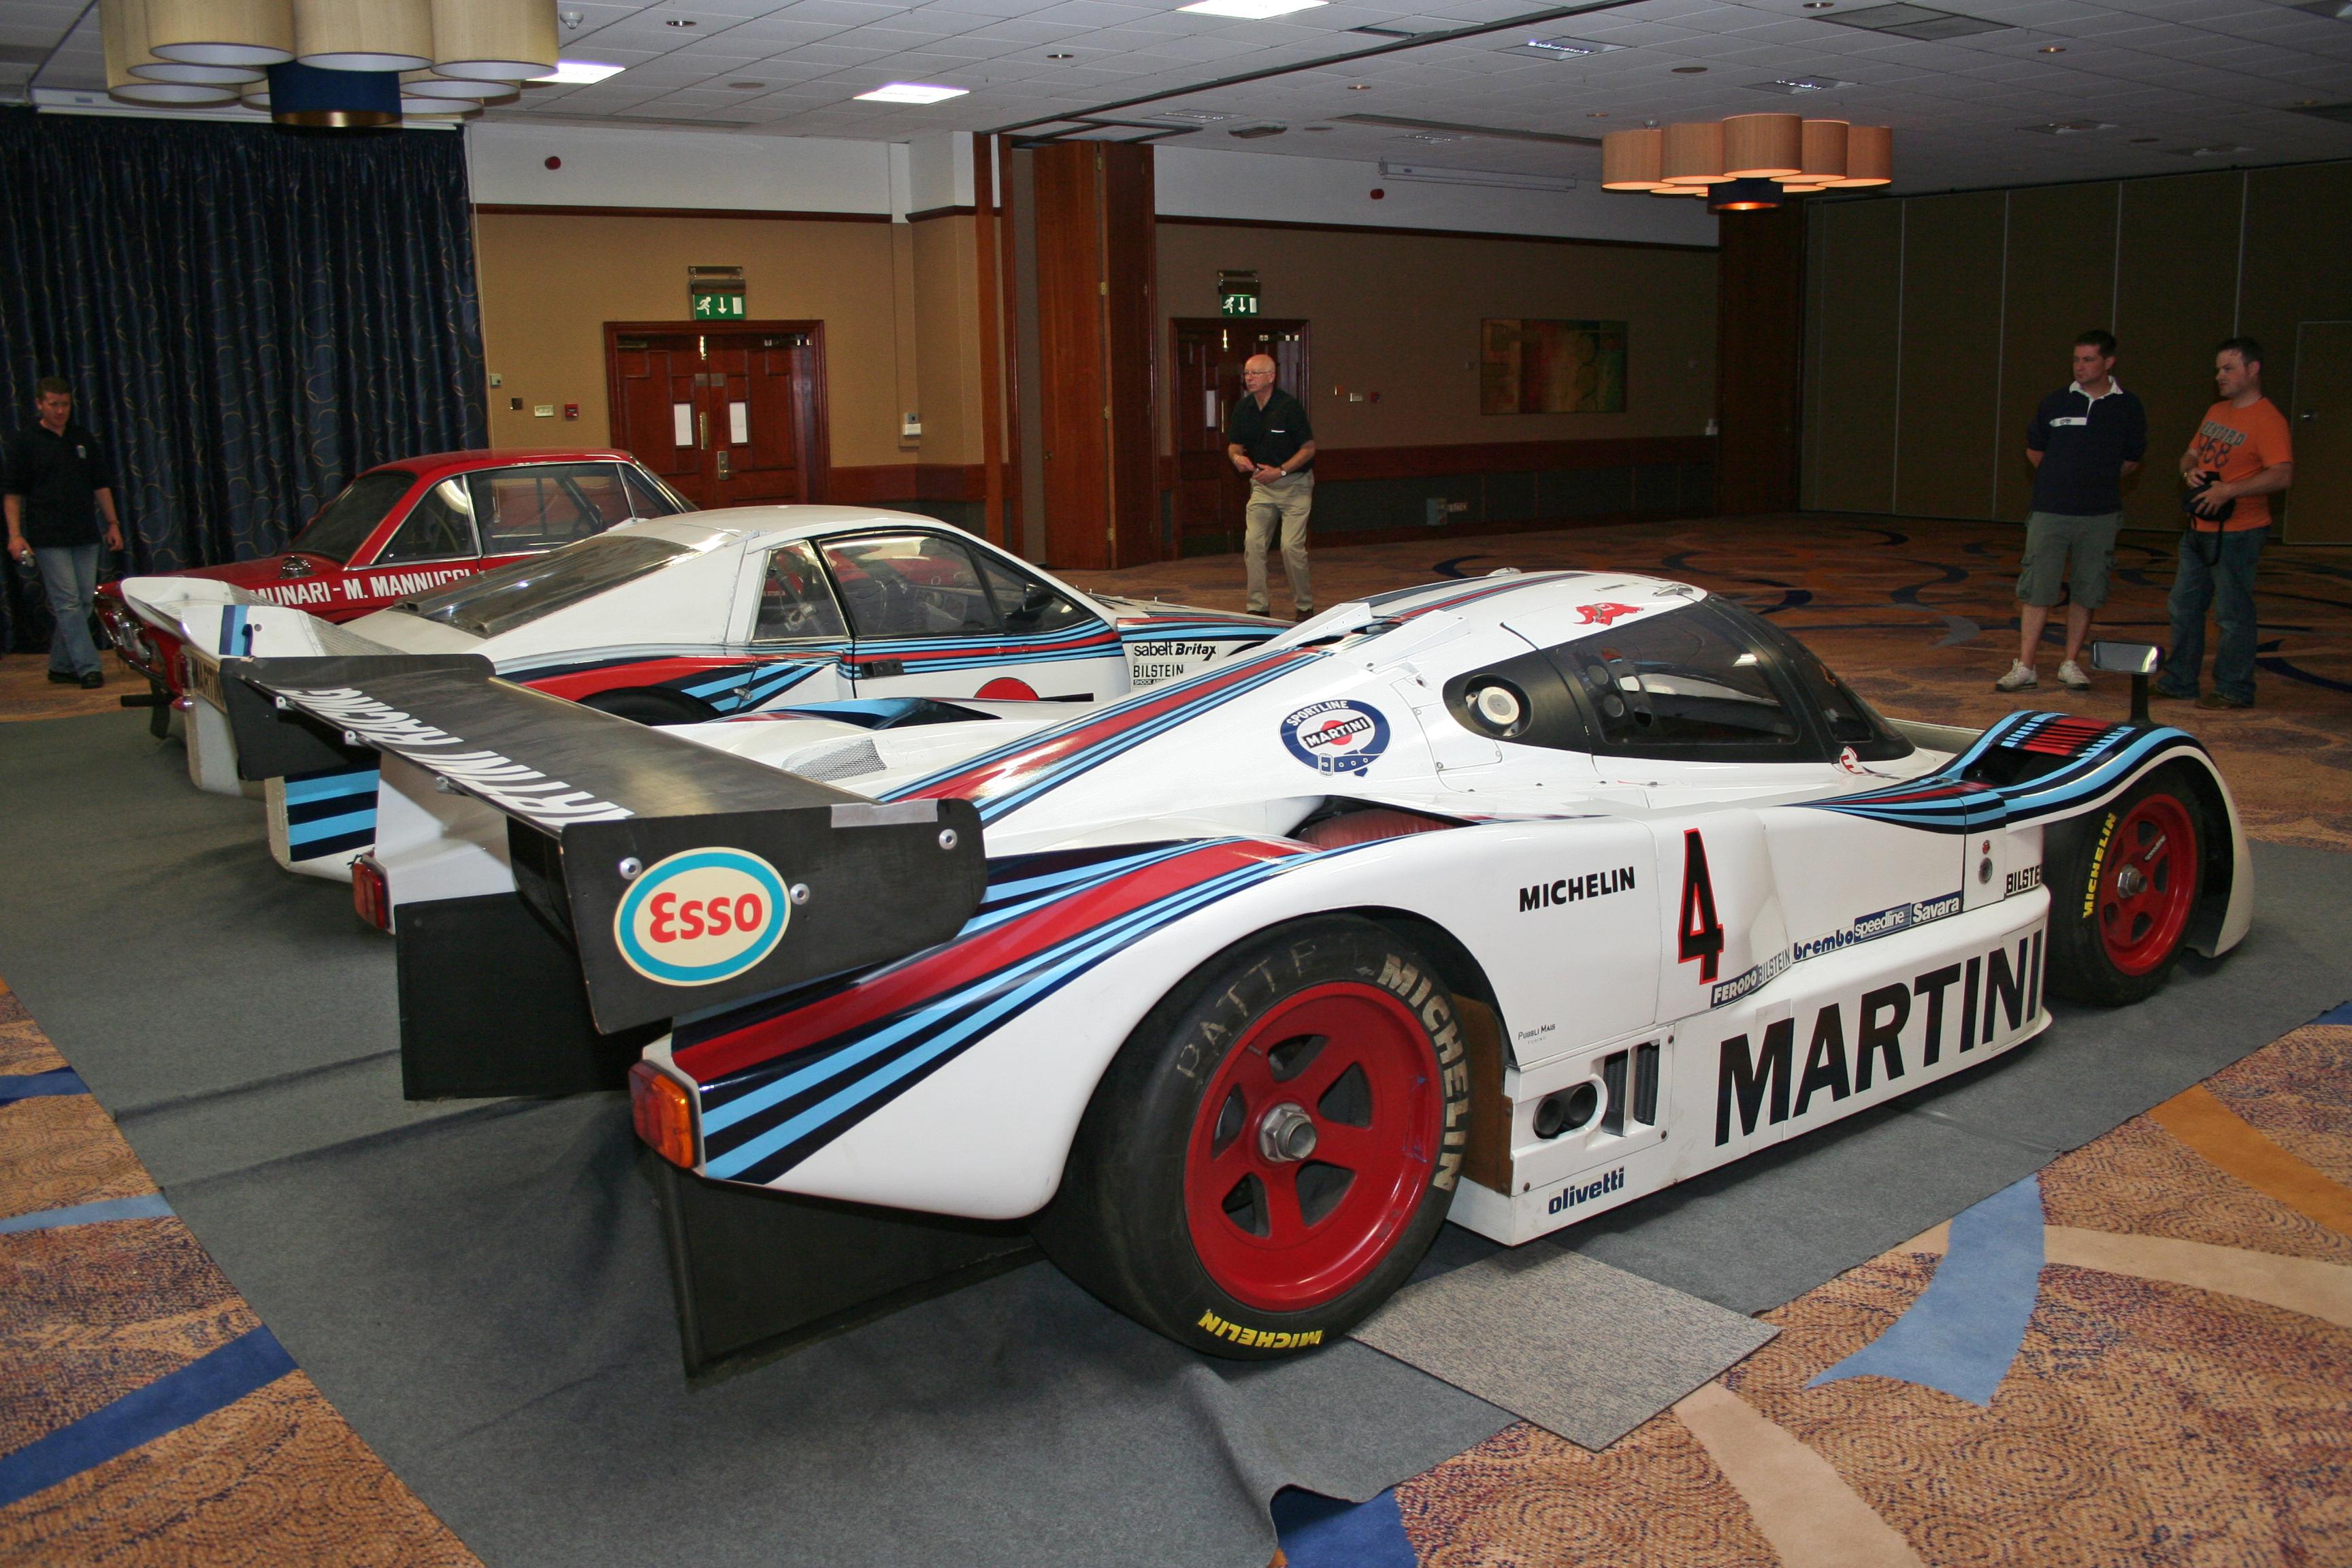 G11 Bmw 730li Launch 14 besides Bmw 2002 Turbo 1974 moreover File BMW Alpina B3 Biturbo E90  13697028285 besides 5733818888 besides Pagani Zonda Mansadat. on bmw 2 0 turbo